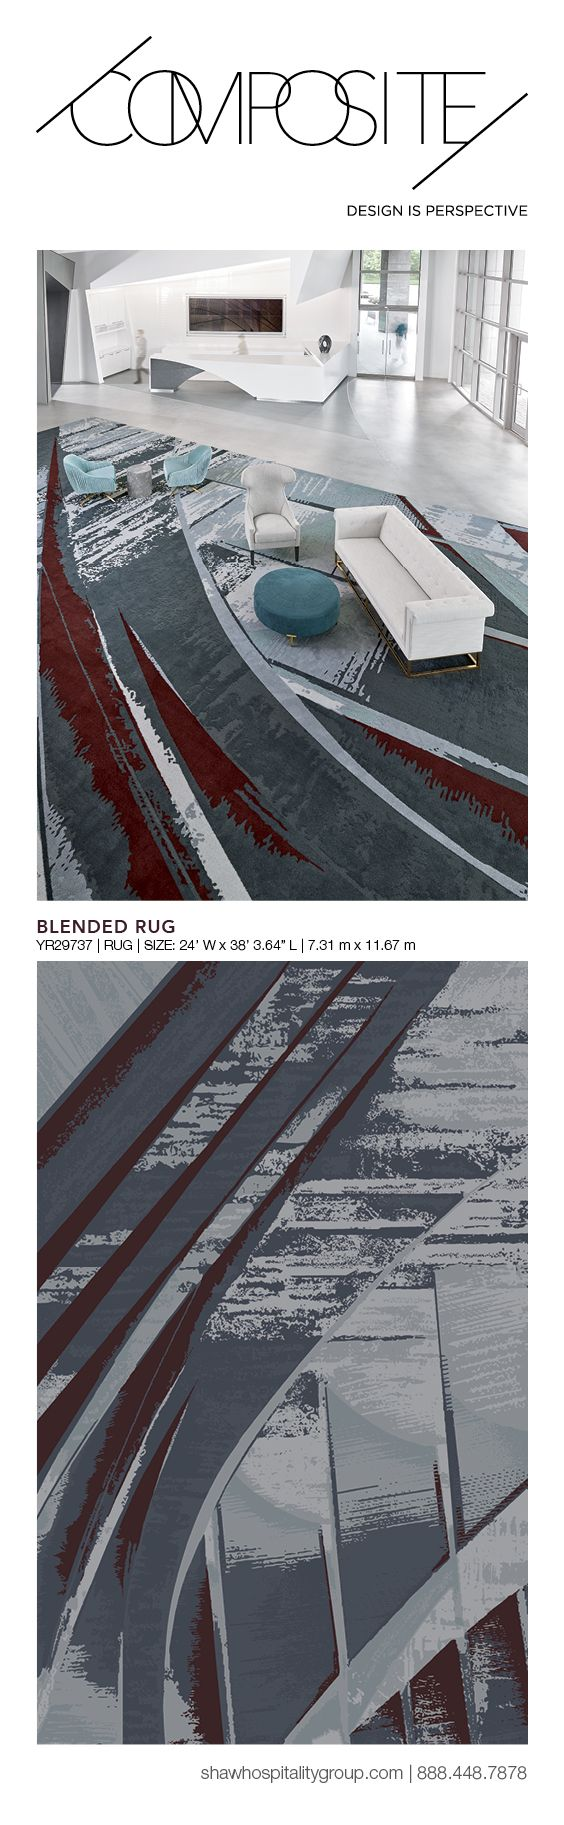 Blended Rug